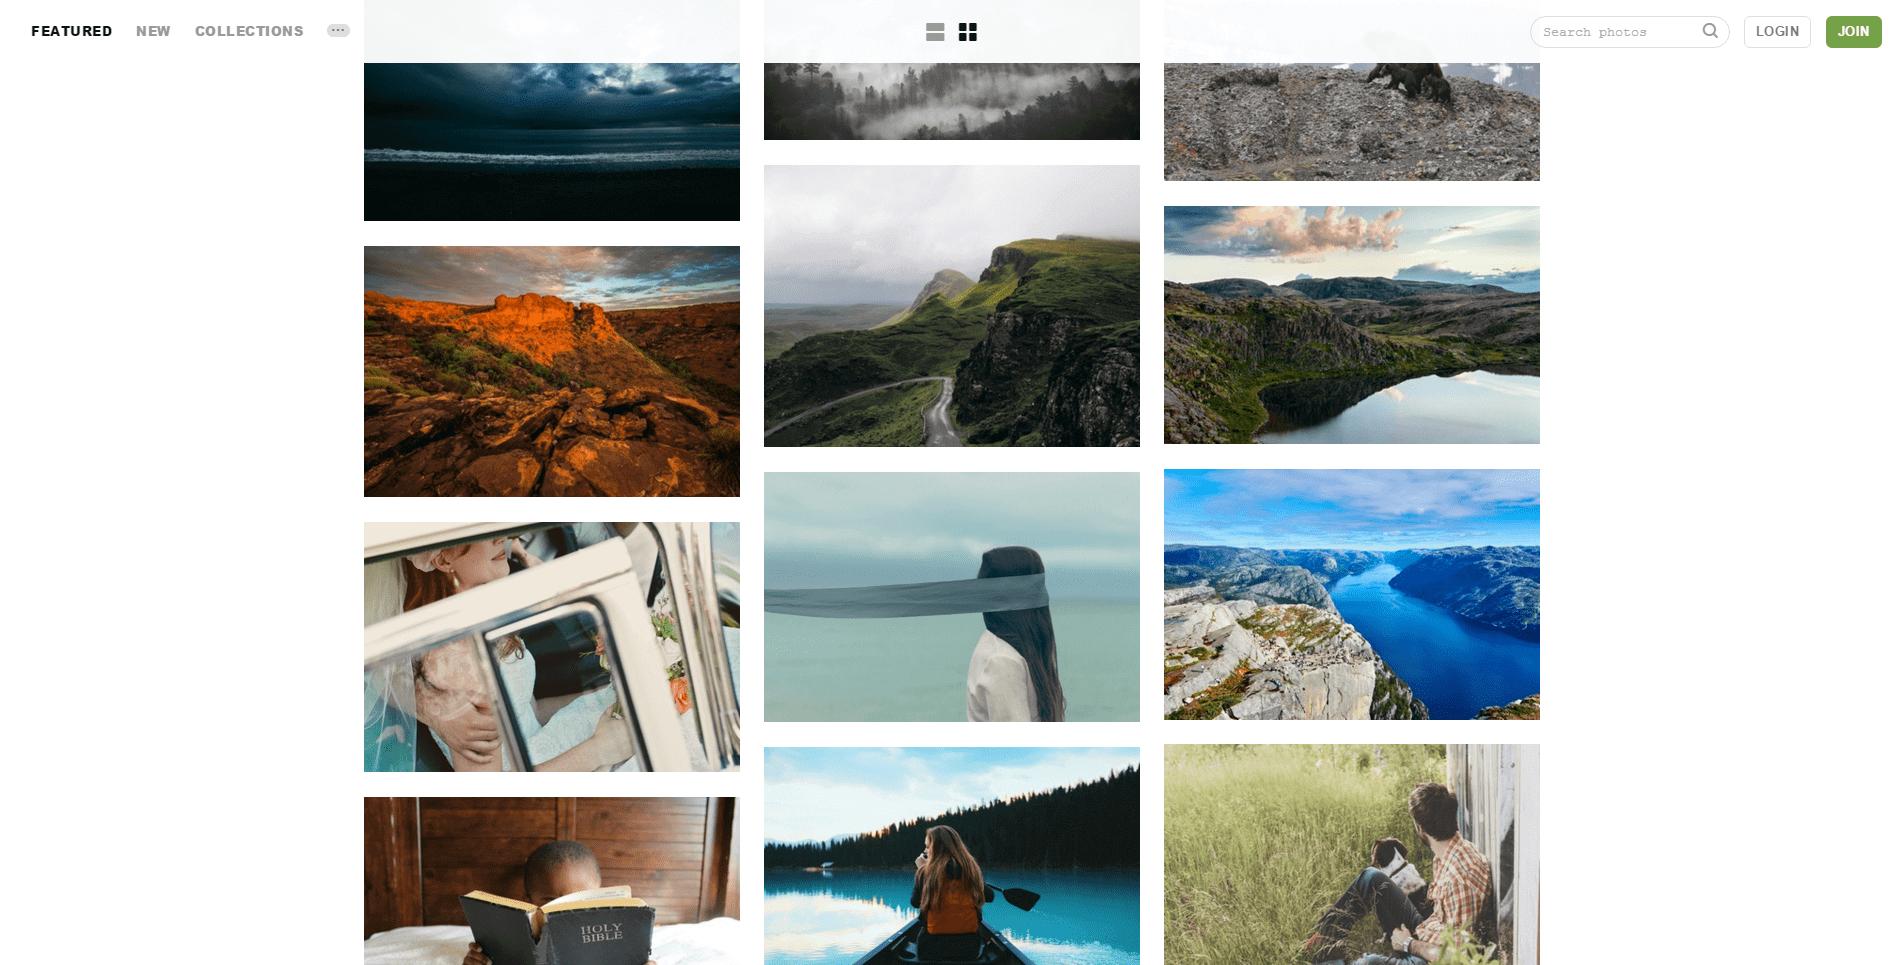 'Unsplash I High-Resolution Photos' - unsplash_com